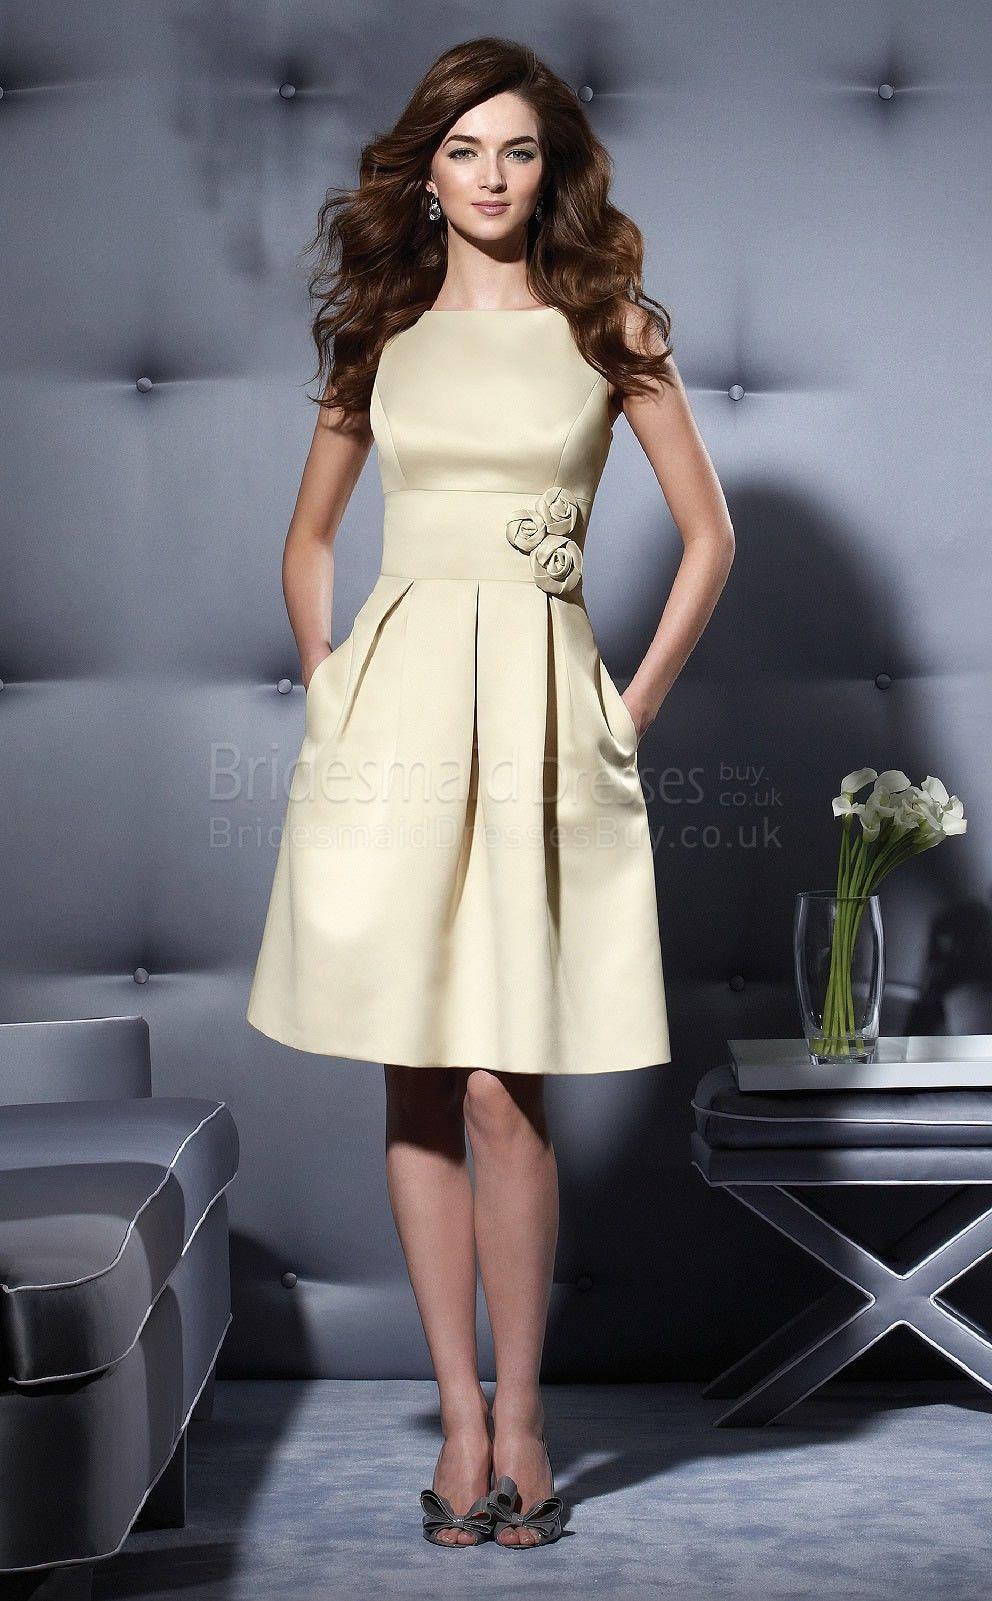 knee length bridesmaid dresses - Google Search | Bridesmaid dress ...